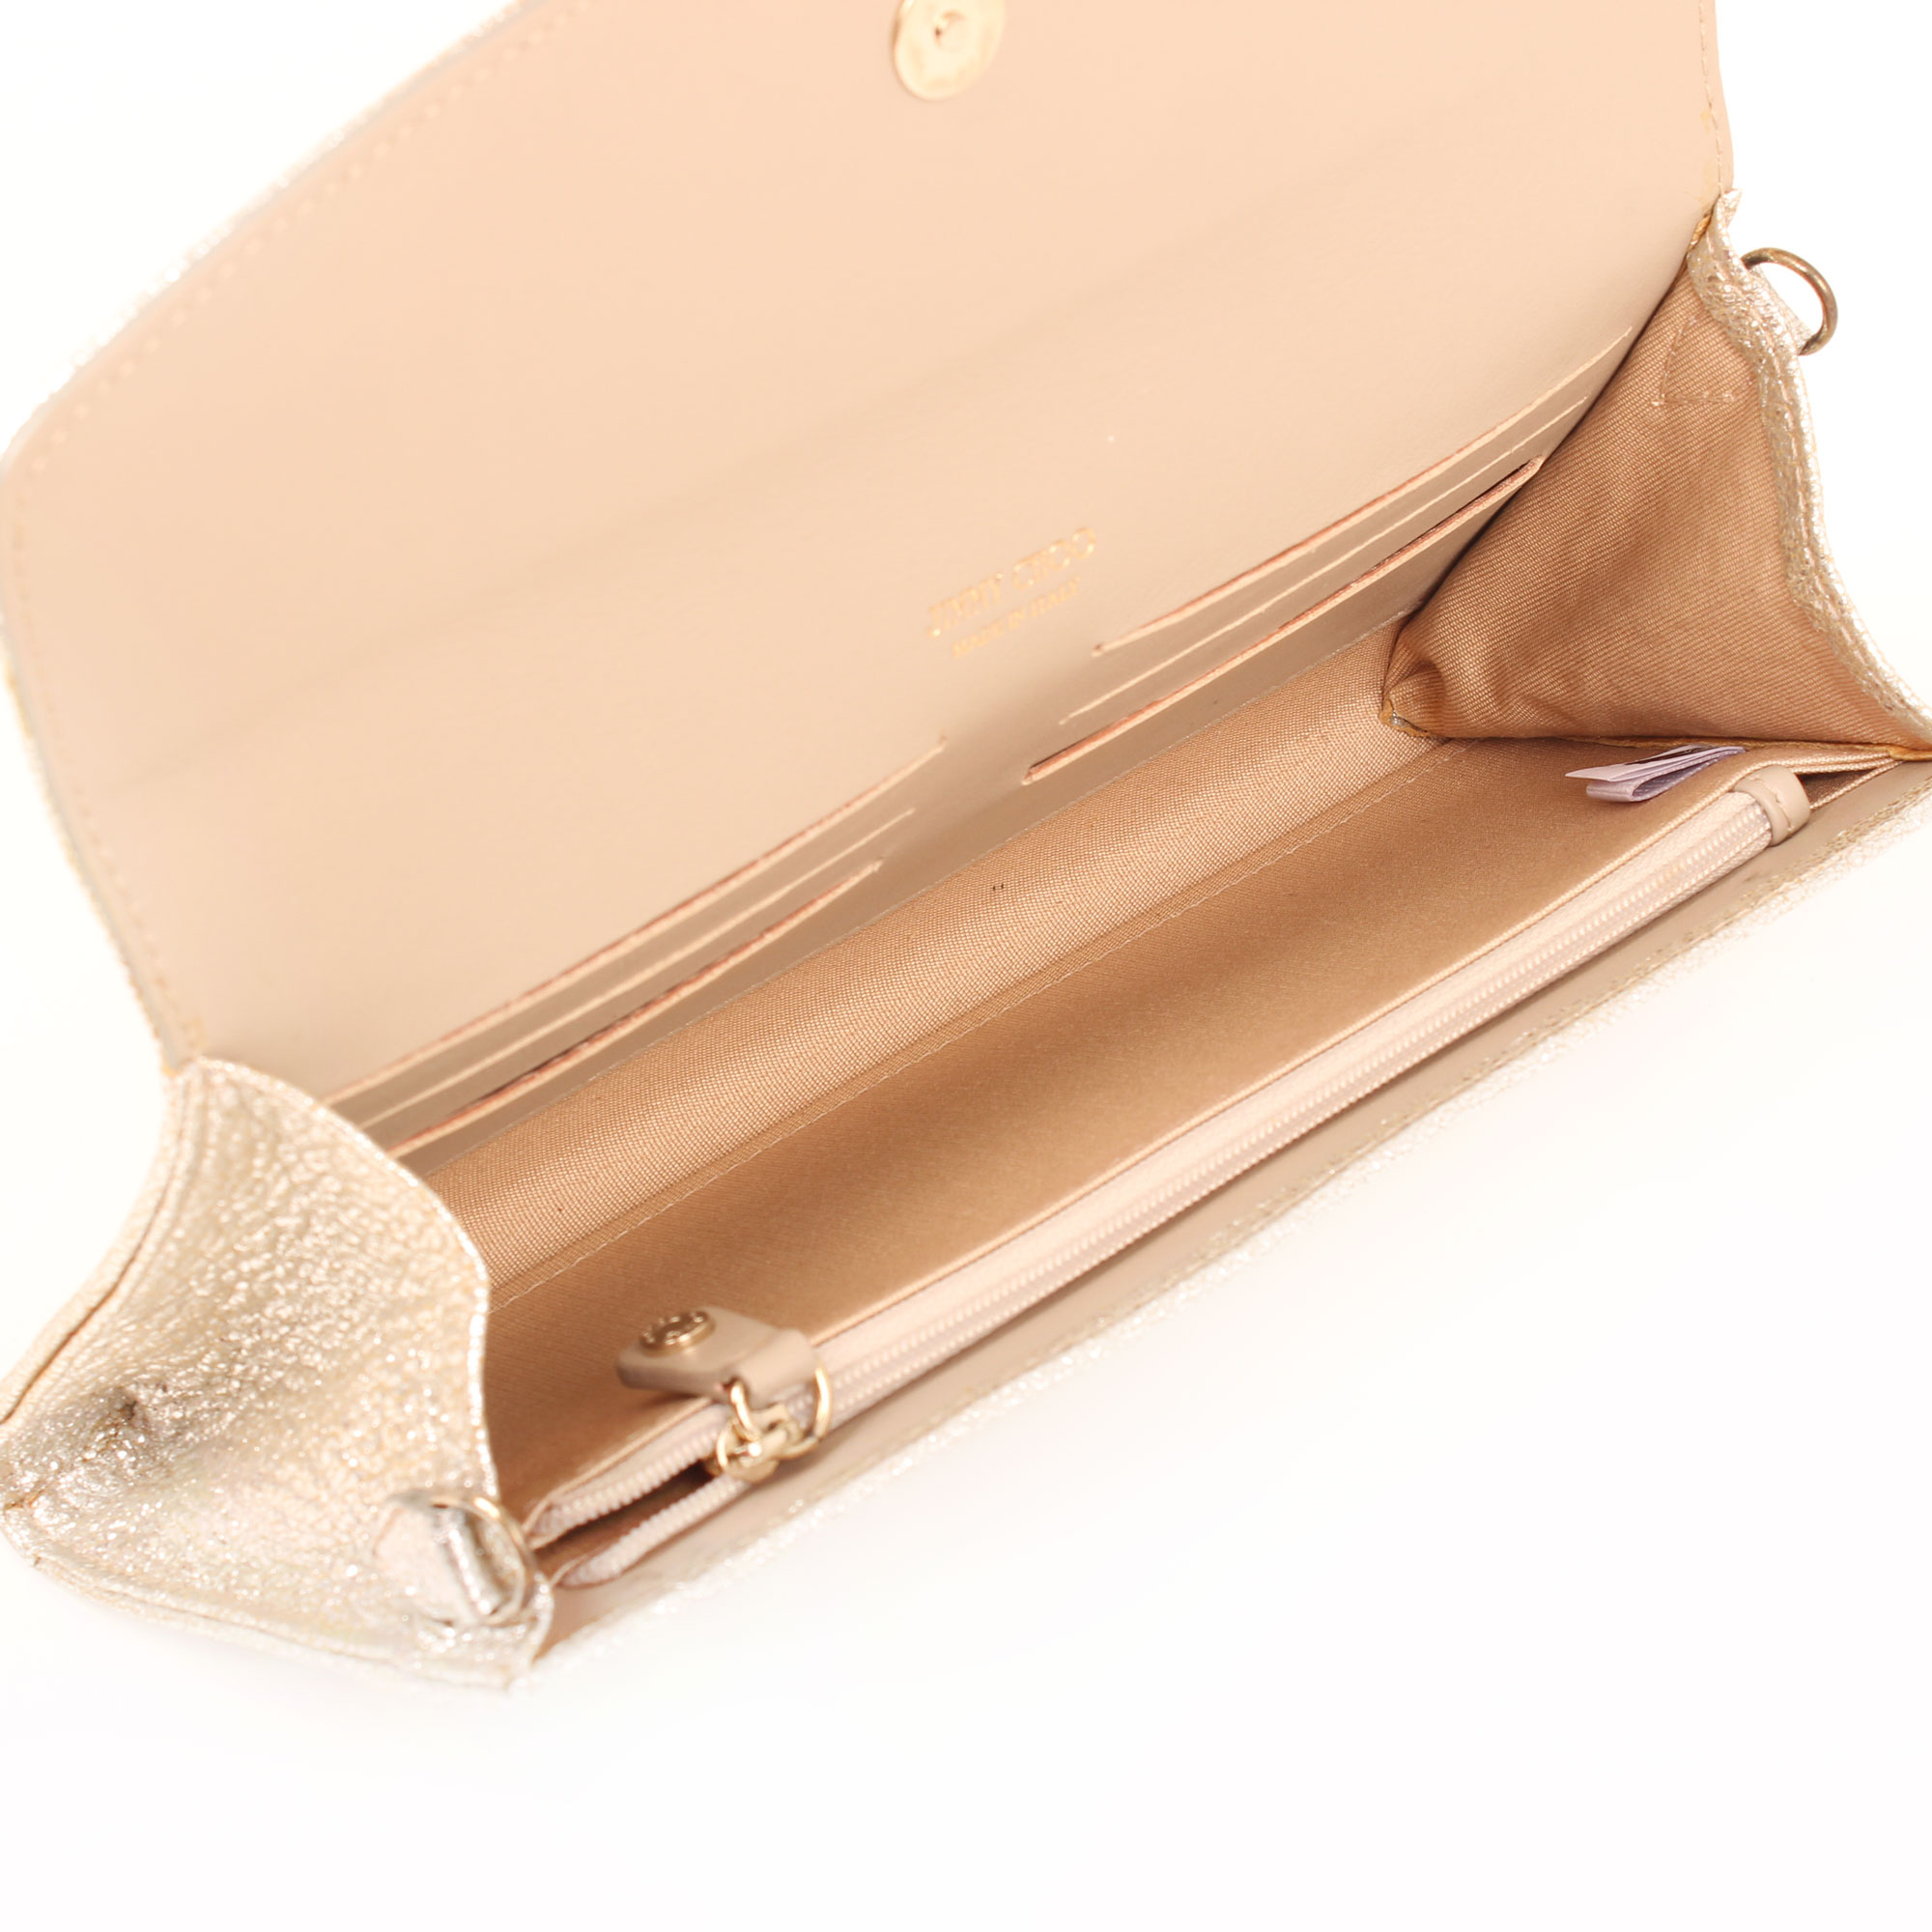 bag-clutch-jimmy-choo-riane-glitter-silver-interior